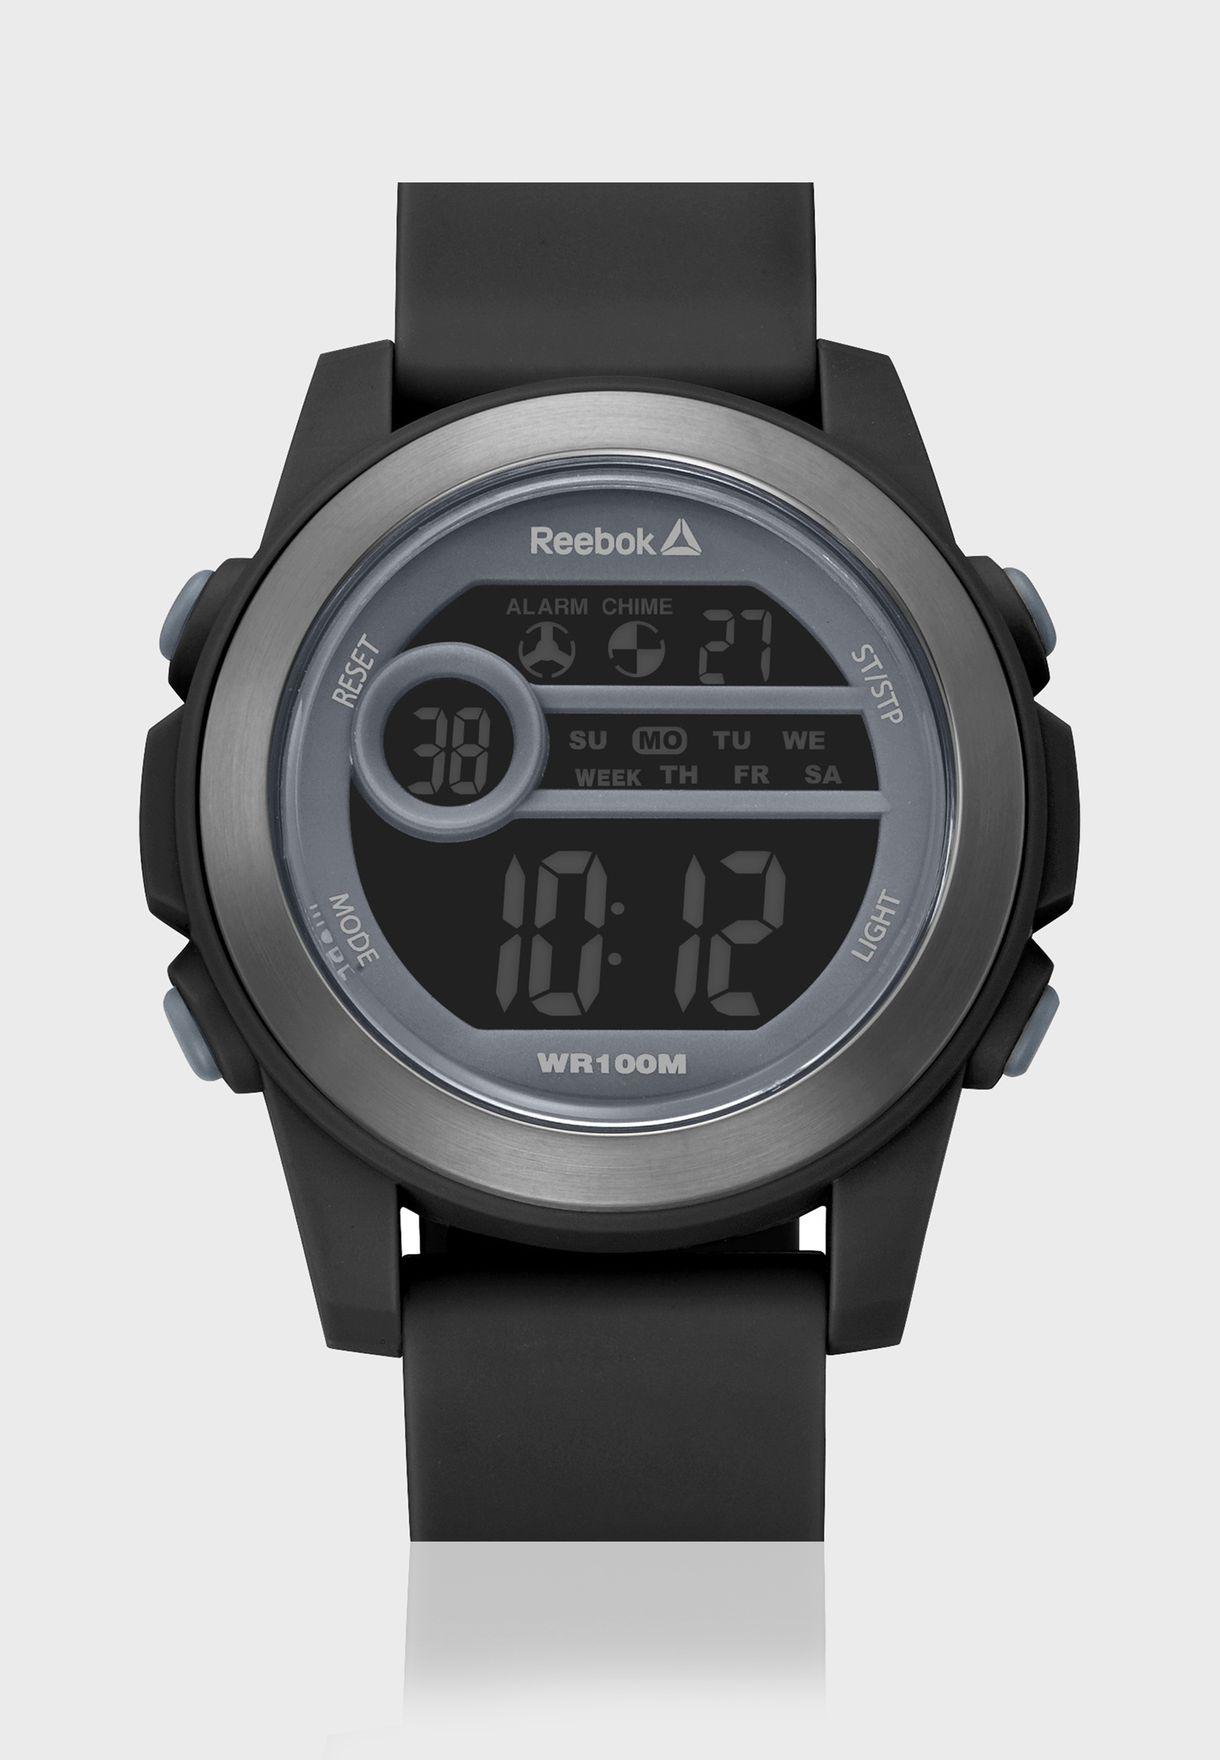 Sleek Smart Watch